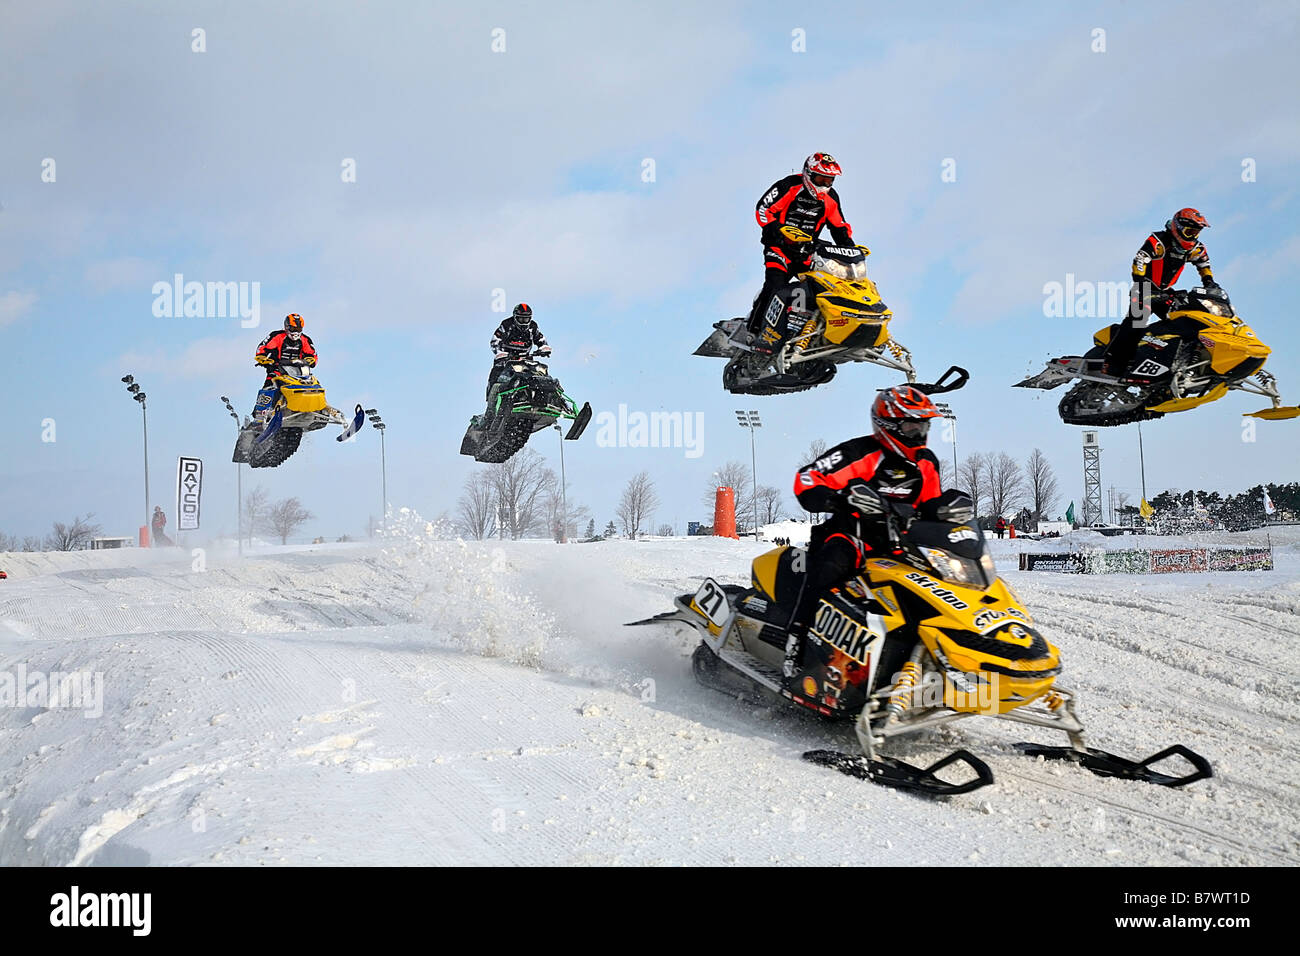 nouveau produit 7851f a0b1b Championship Snowcross or Snowmobile race in Ontario Canada ...